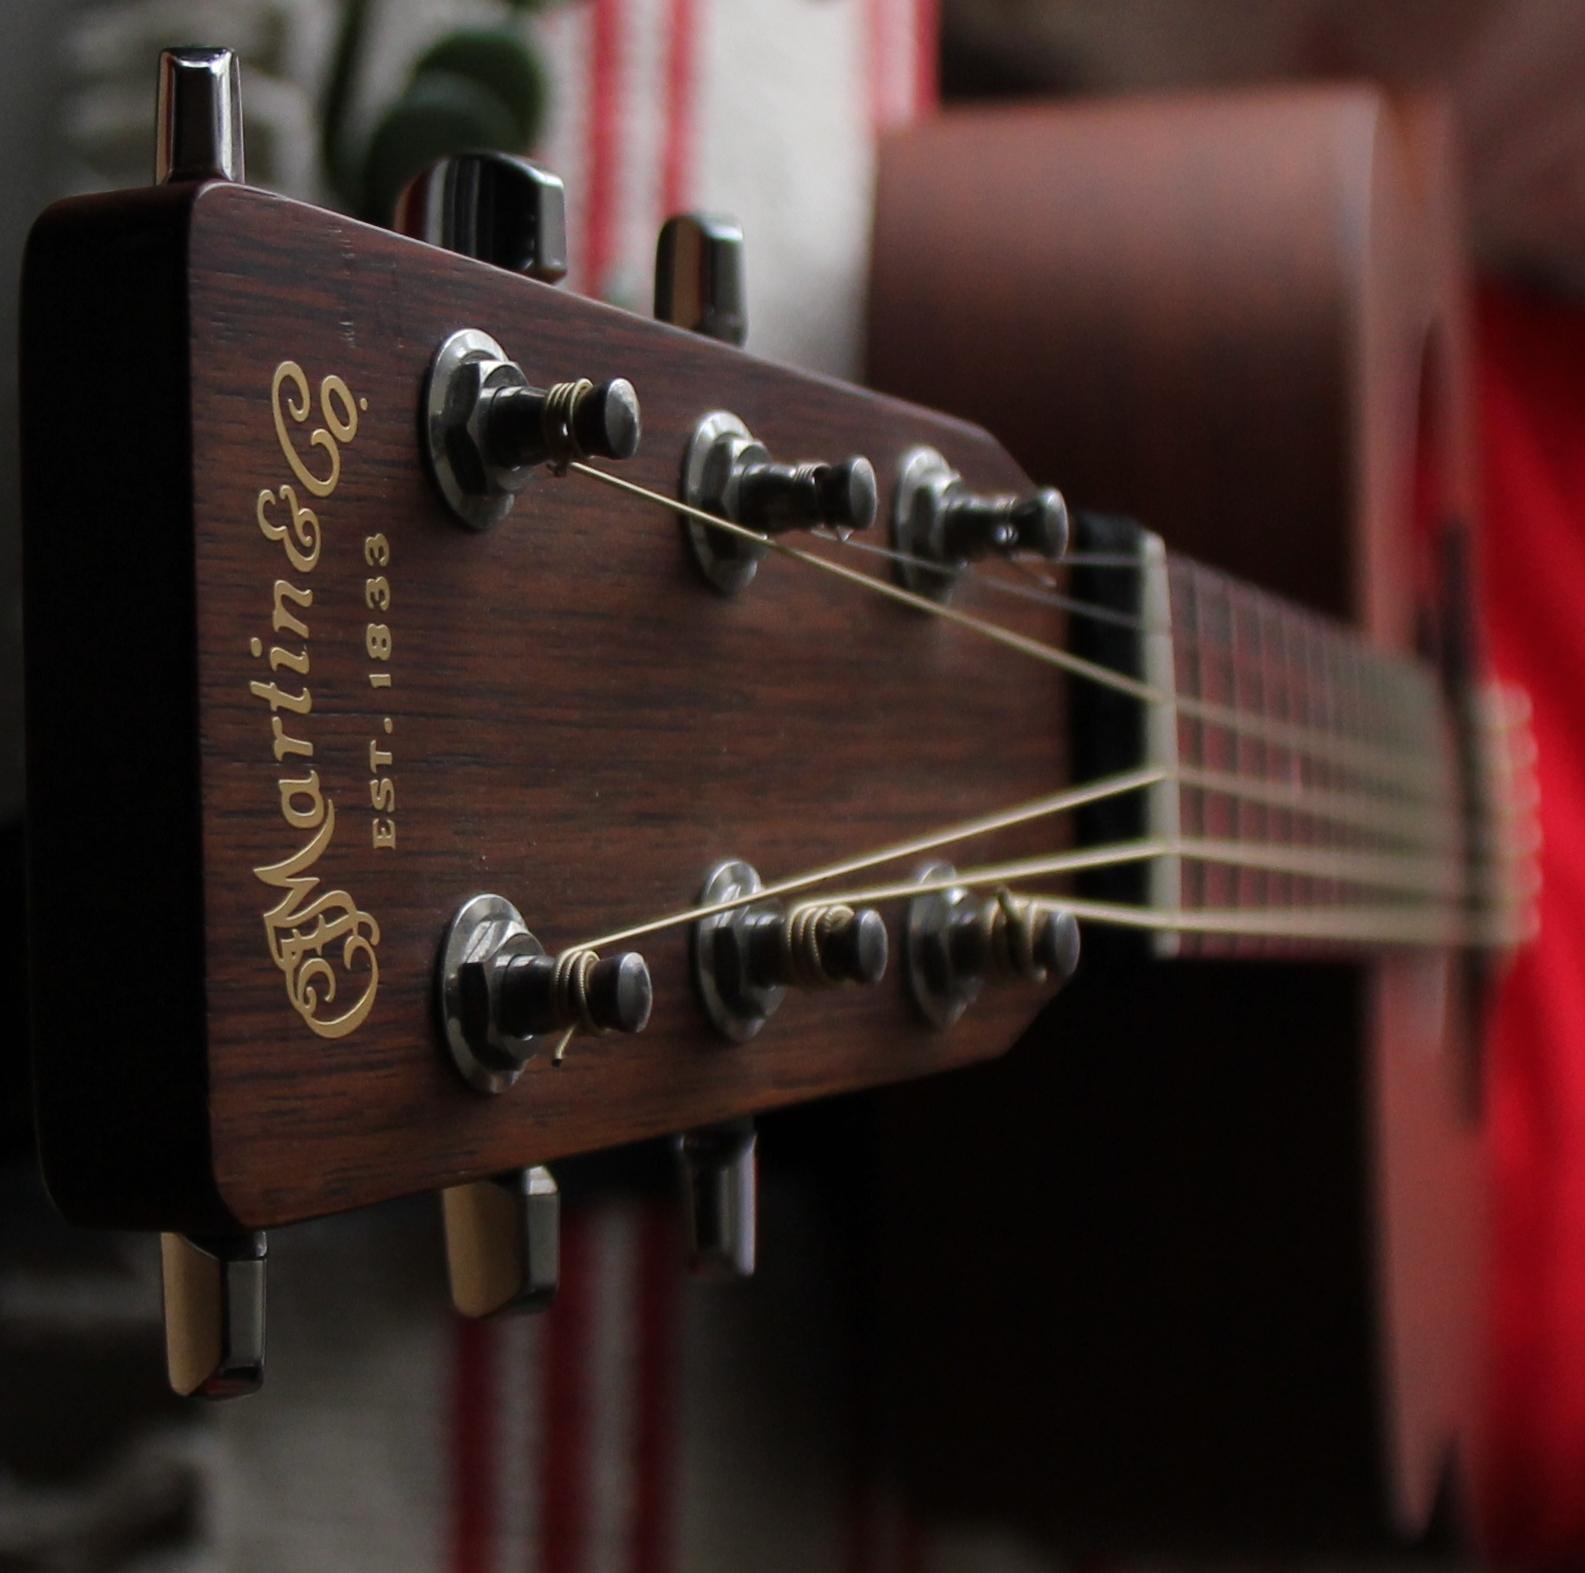 martin co d 15 acoustic guitar user review. Black Bedroom Furniture Sets. Home Design Ideas